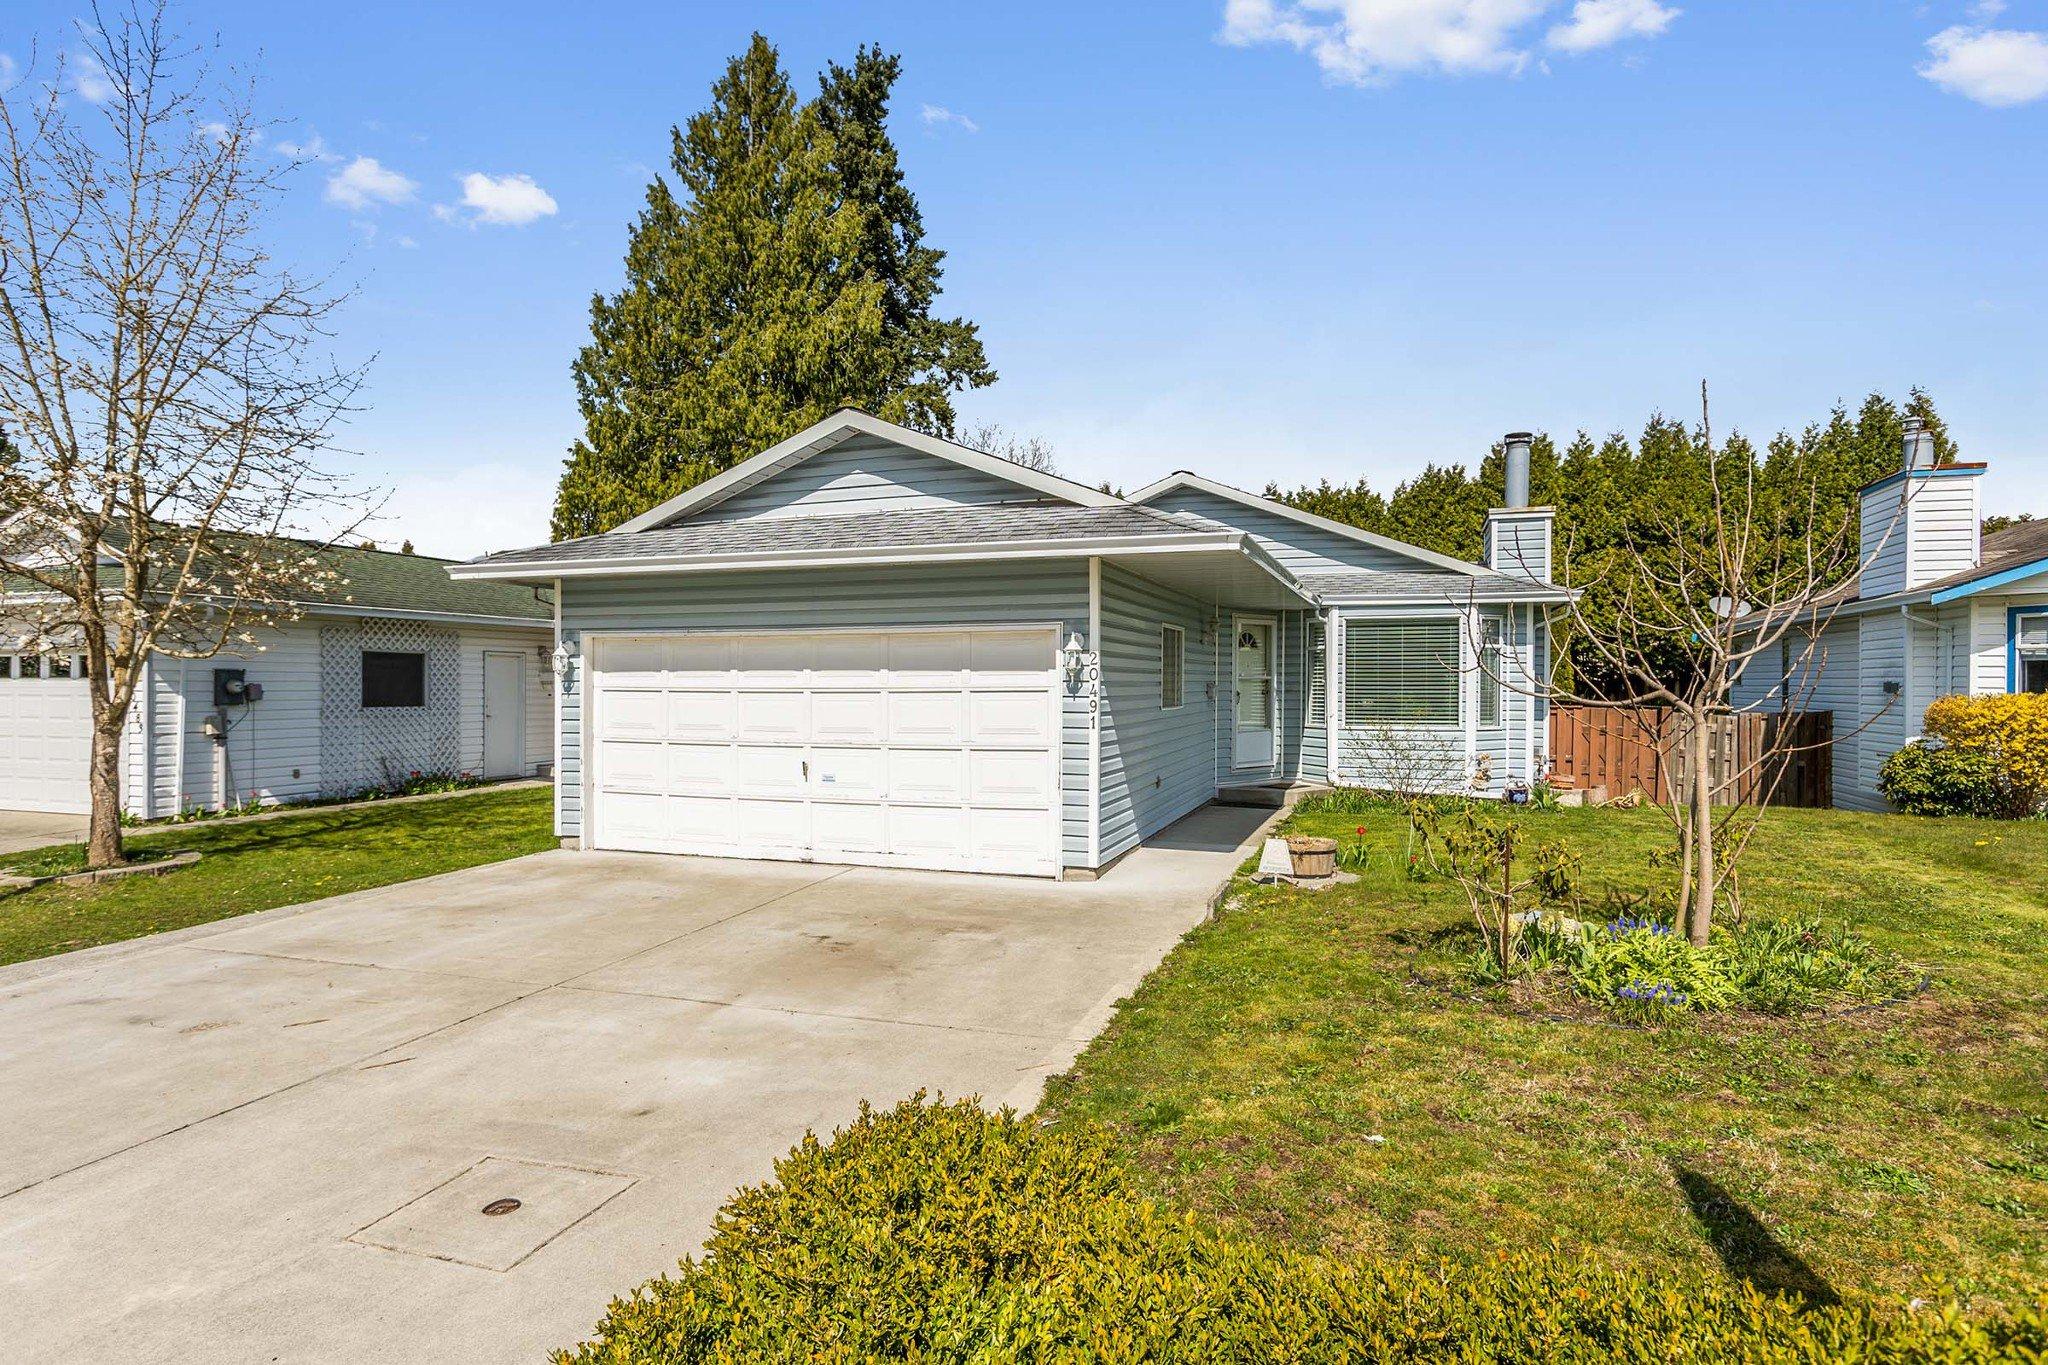 Main Photo: 20491 118 Avenue in Maple Ridge: Southwest Maple Ridge House for sale : MLS®# R2449593